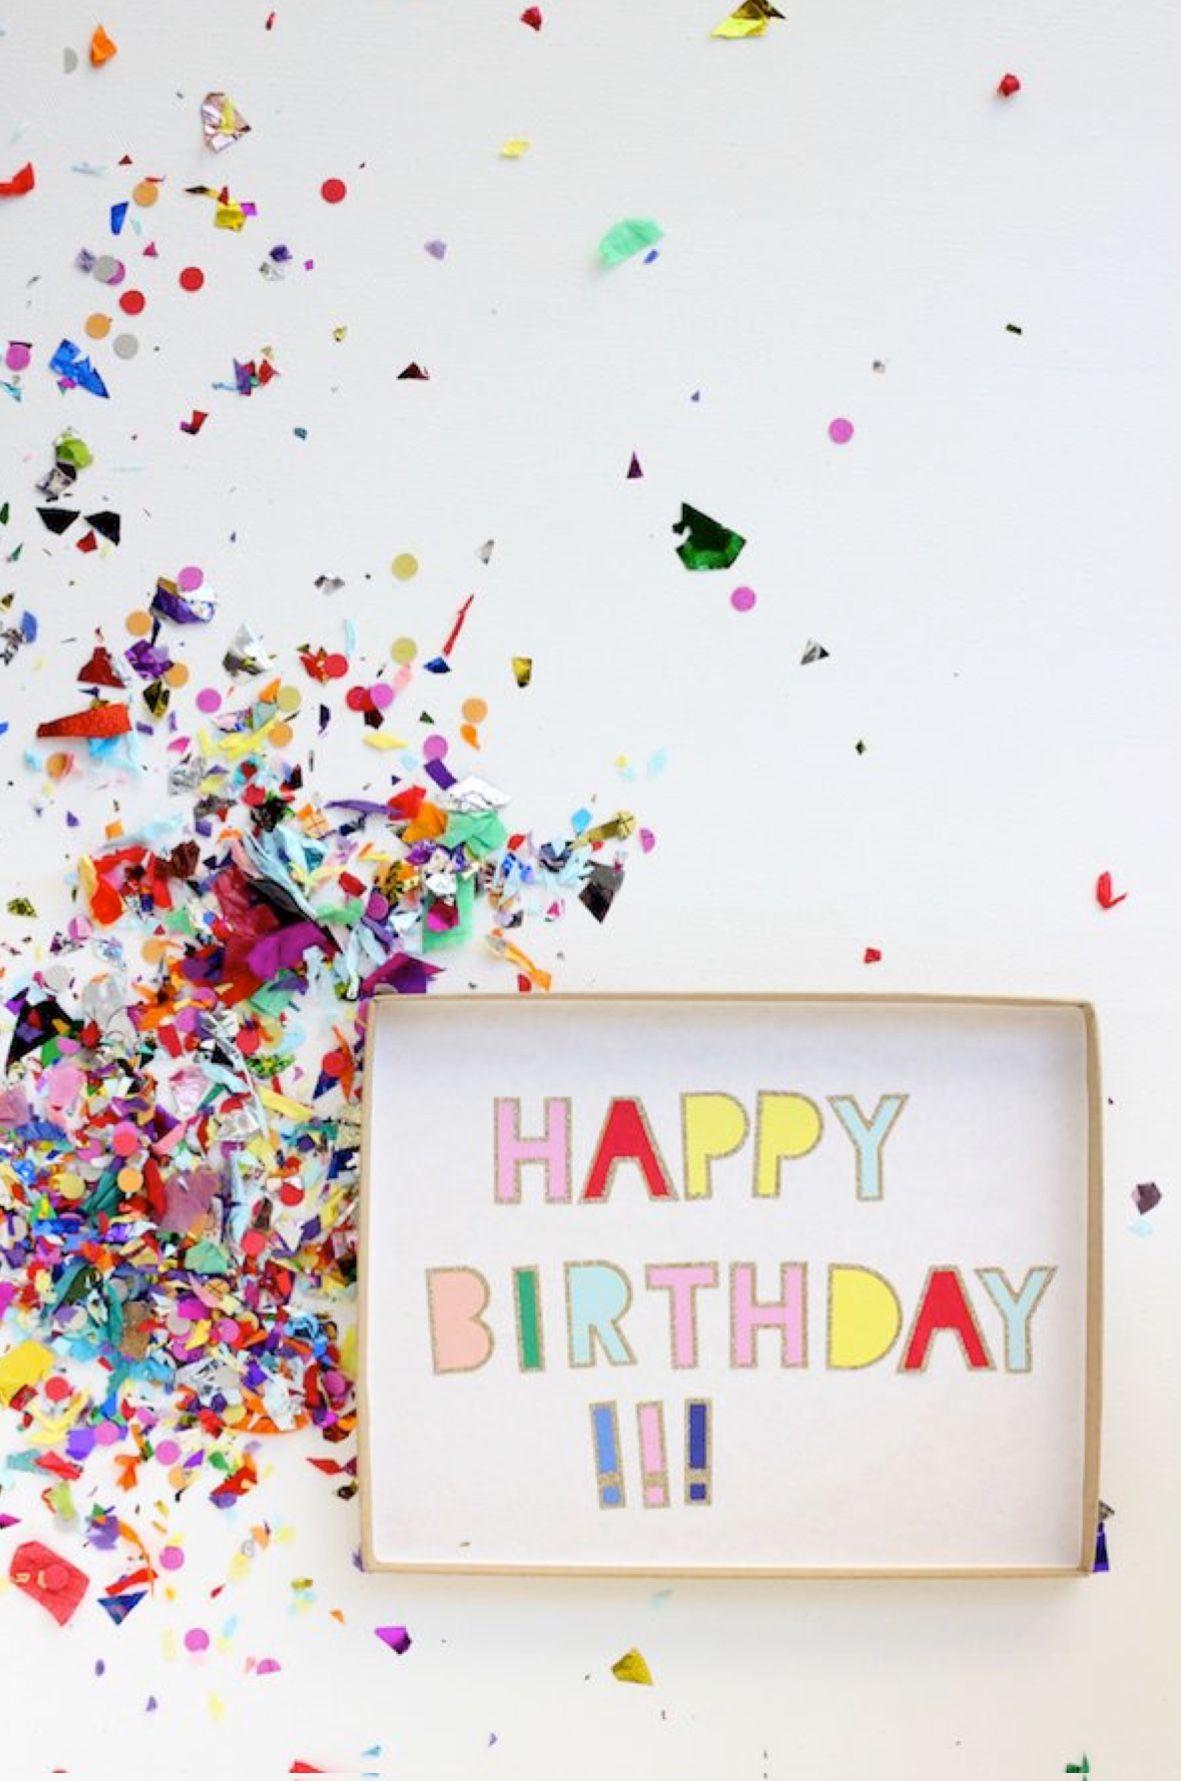 Happy Birthday Jasmin Austin Tierhilfe Miezekatze E V